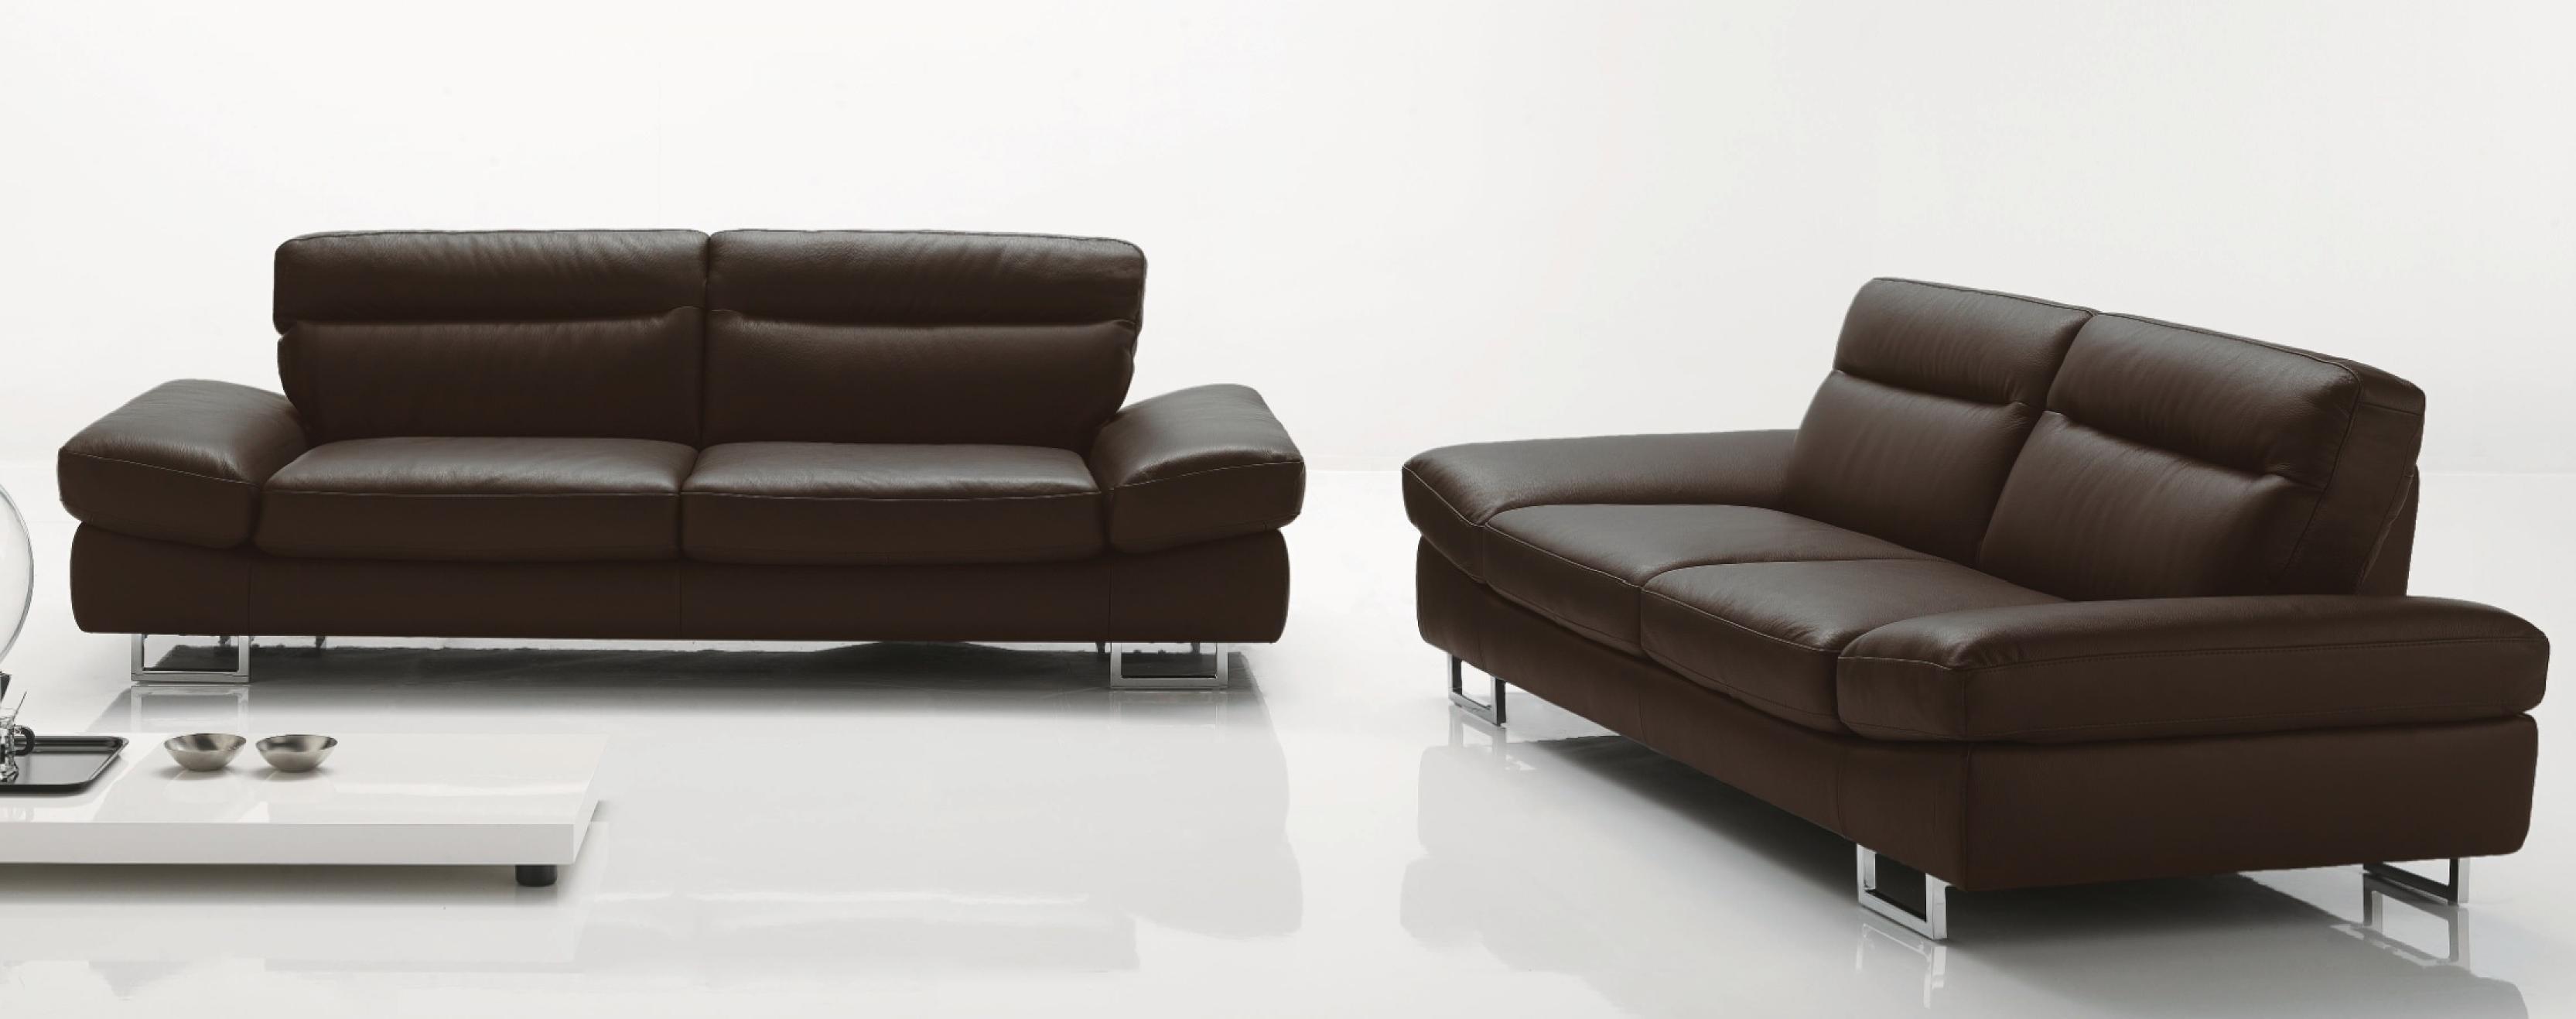 canap convertible cuir marron simple canape convertible with canap convertible cuir marron. Black Bedroom Furniture Sets. Home Design Ideas